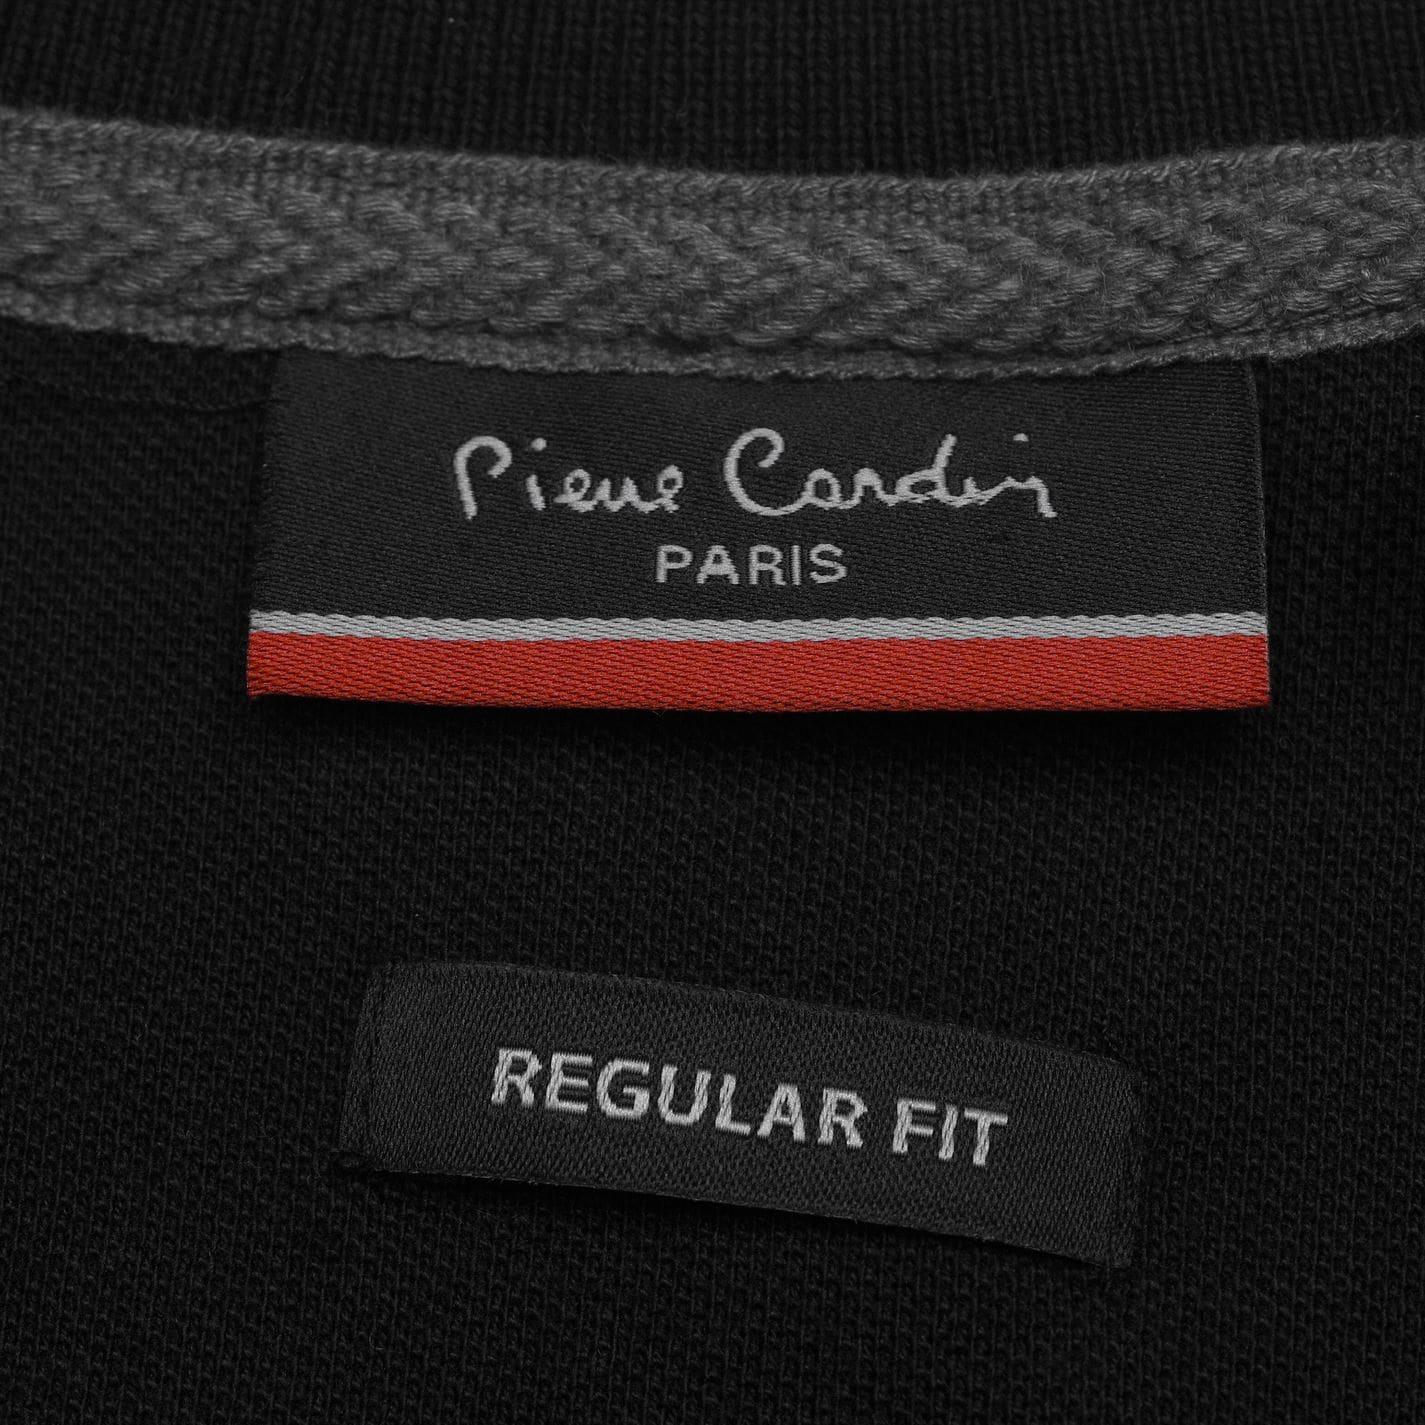 NEW-Pierre-Cardin-Mens-Long-Sleeve-Pure-Cotton-Polo-Shirt-Size-S-M-L-XL-XXL thumbnail 13